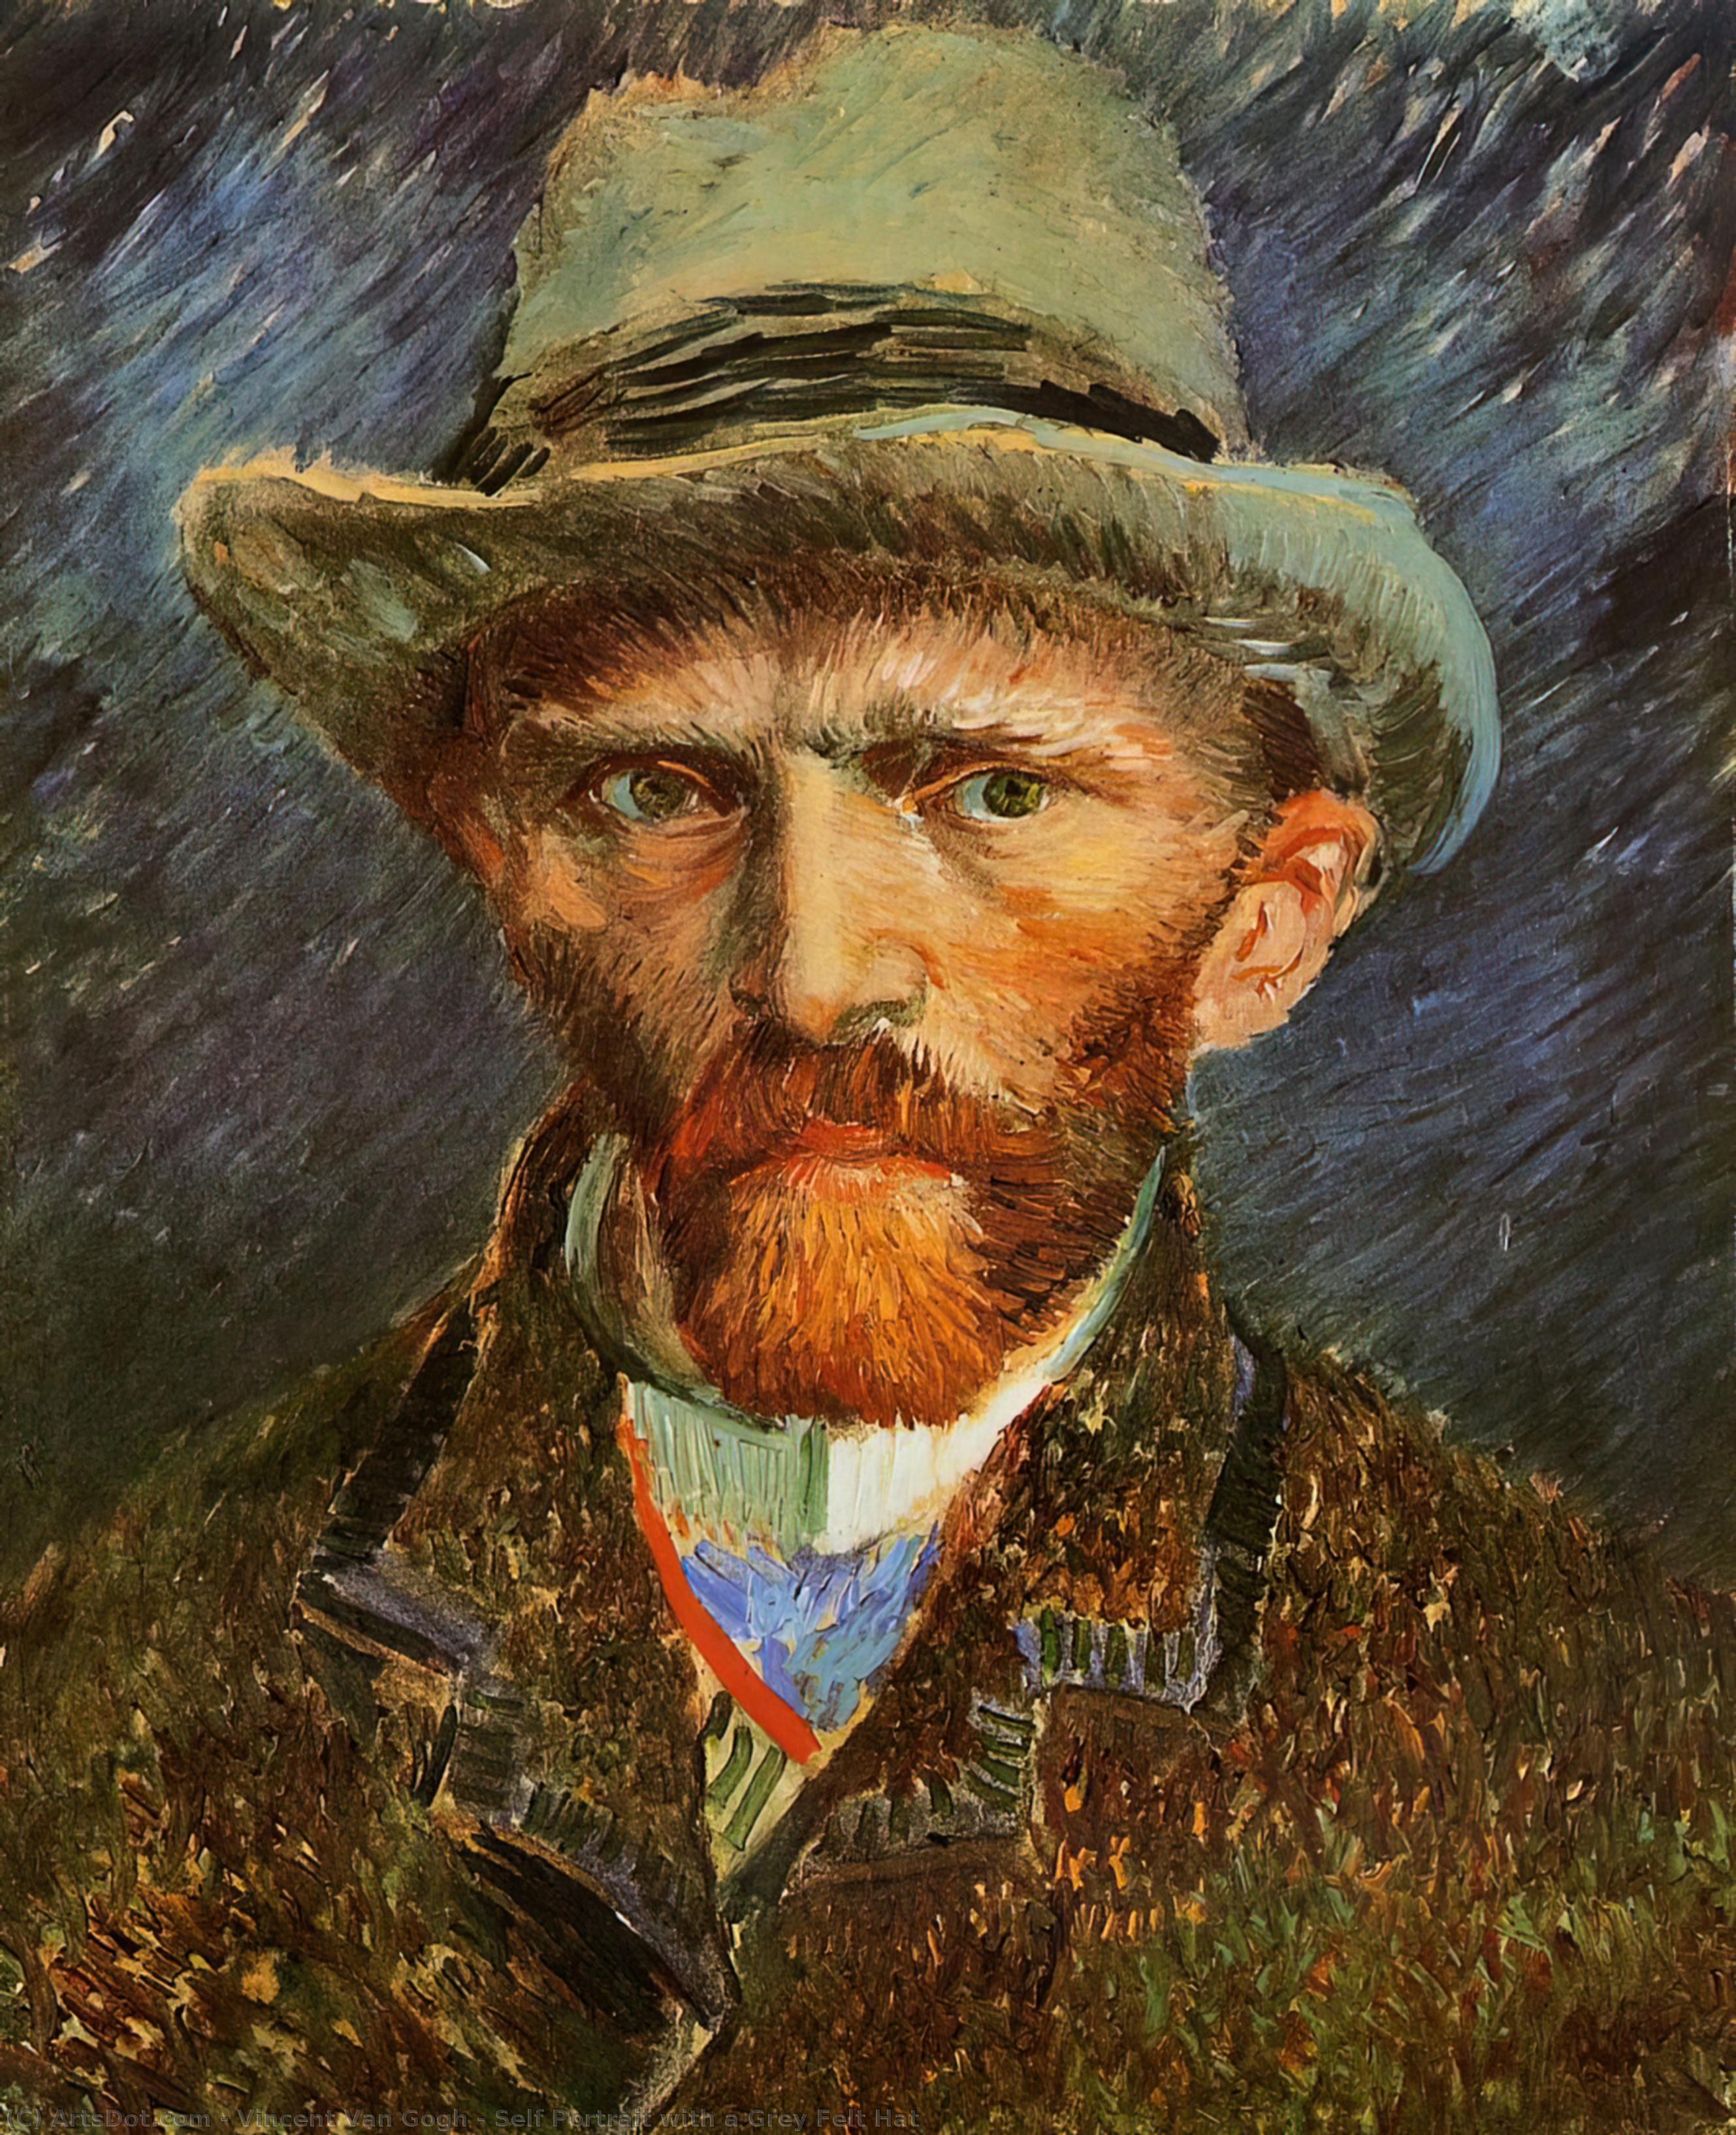 Grigio Vincent Autoritratto Gogh Con Un Van Feltro Cappello XwRZEq1